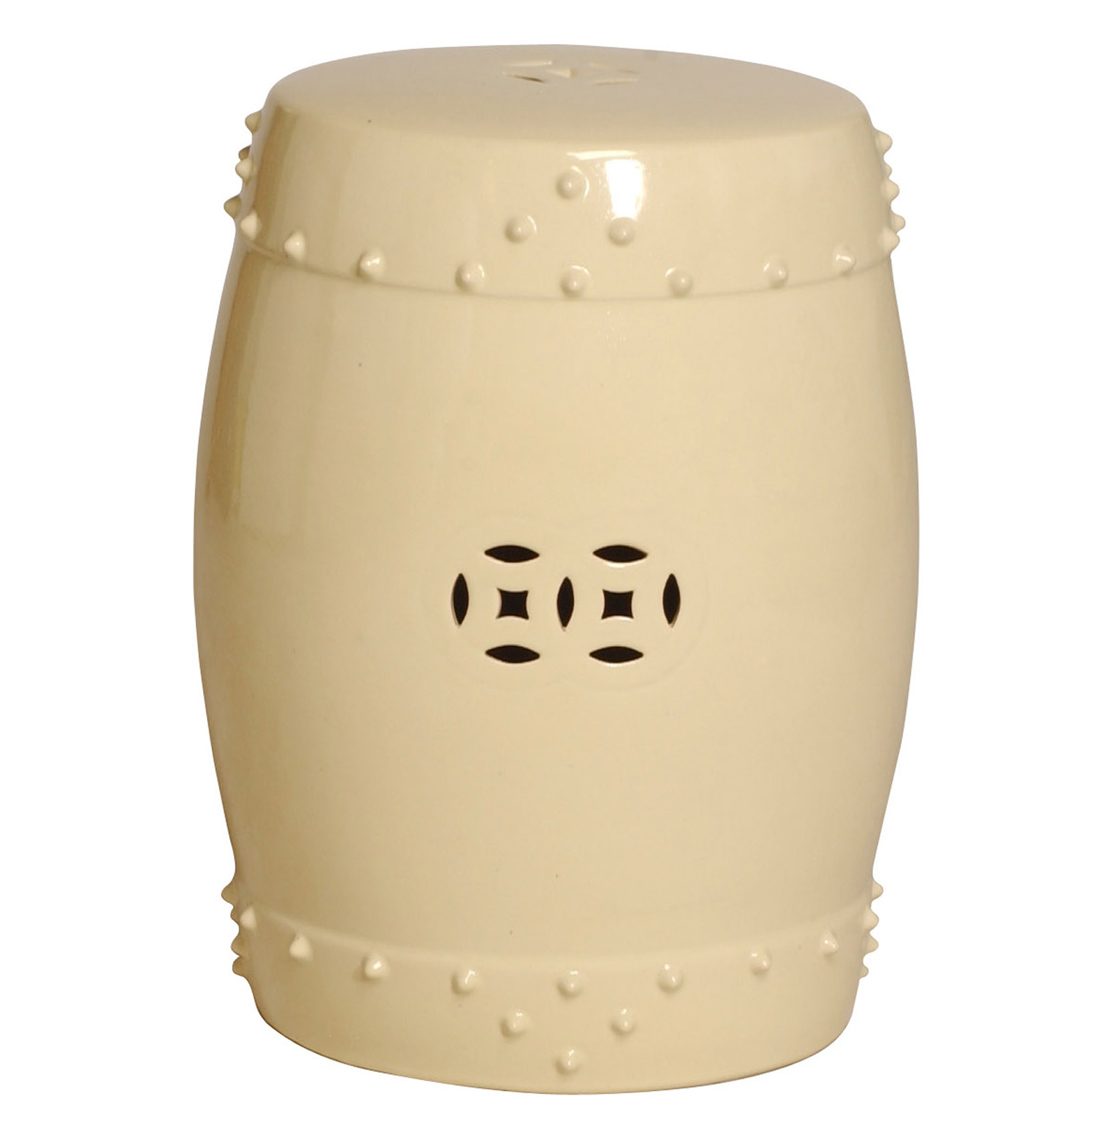 Classic Prosperity Ivory Cream Ceramic Pierced Garden Seat Stool